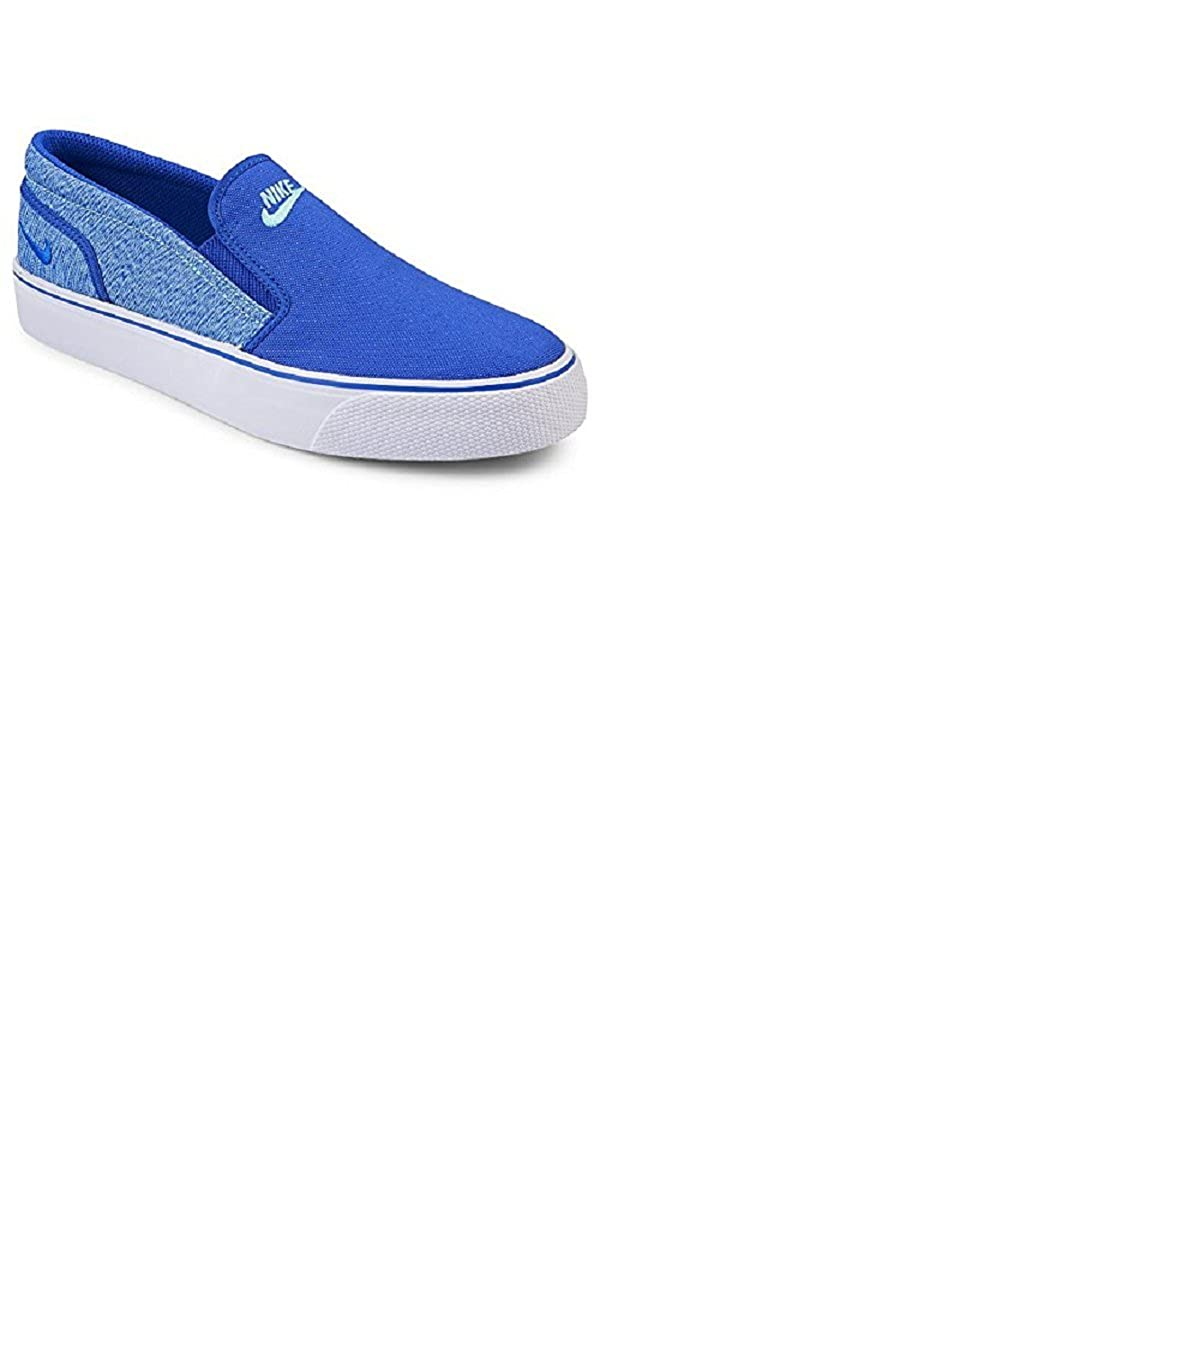 NIKE Women's Toki Slip Canvas Fashion Sneakers Racer Blue 724770 443 B00Y19FUF6 7 B(M) US